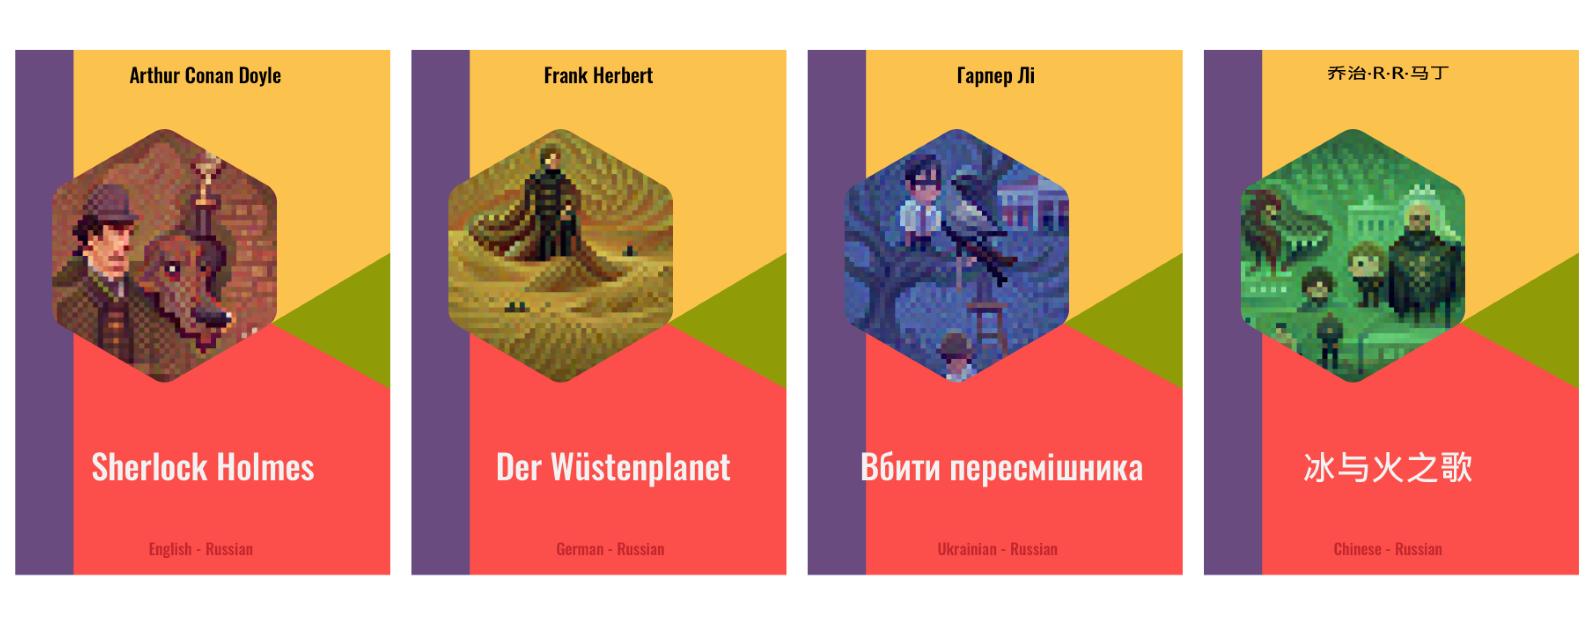 Lingtrain books